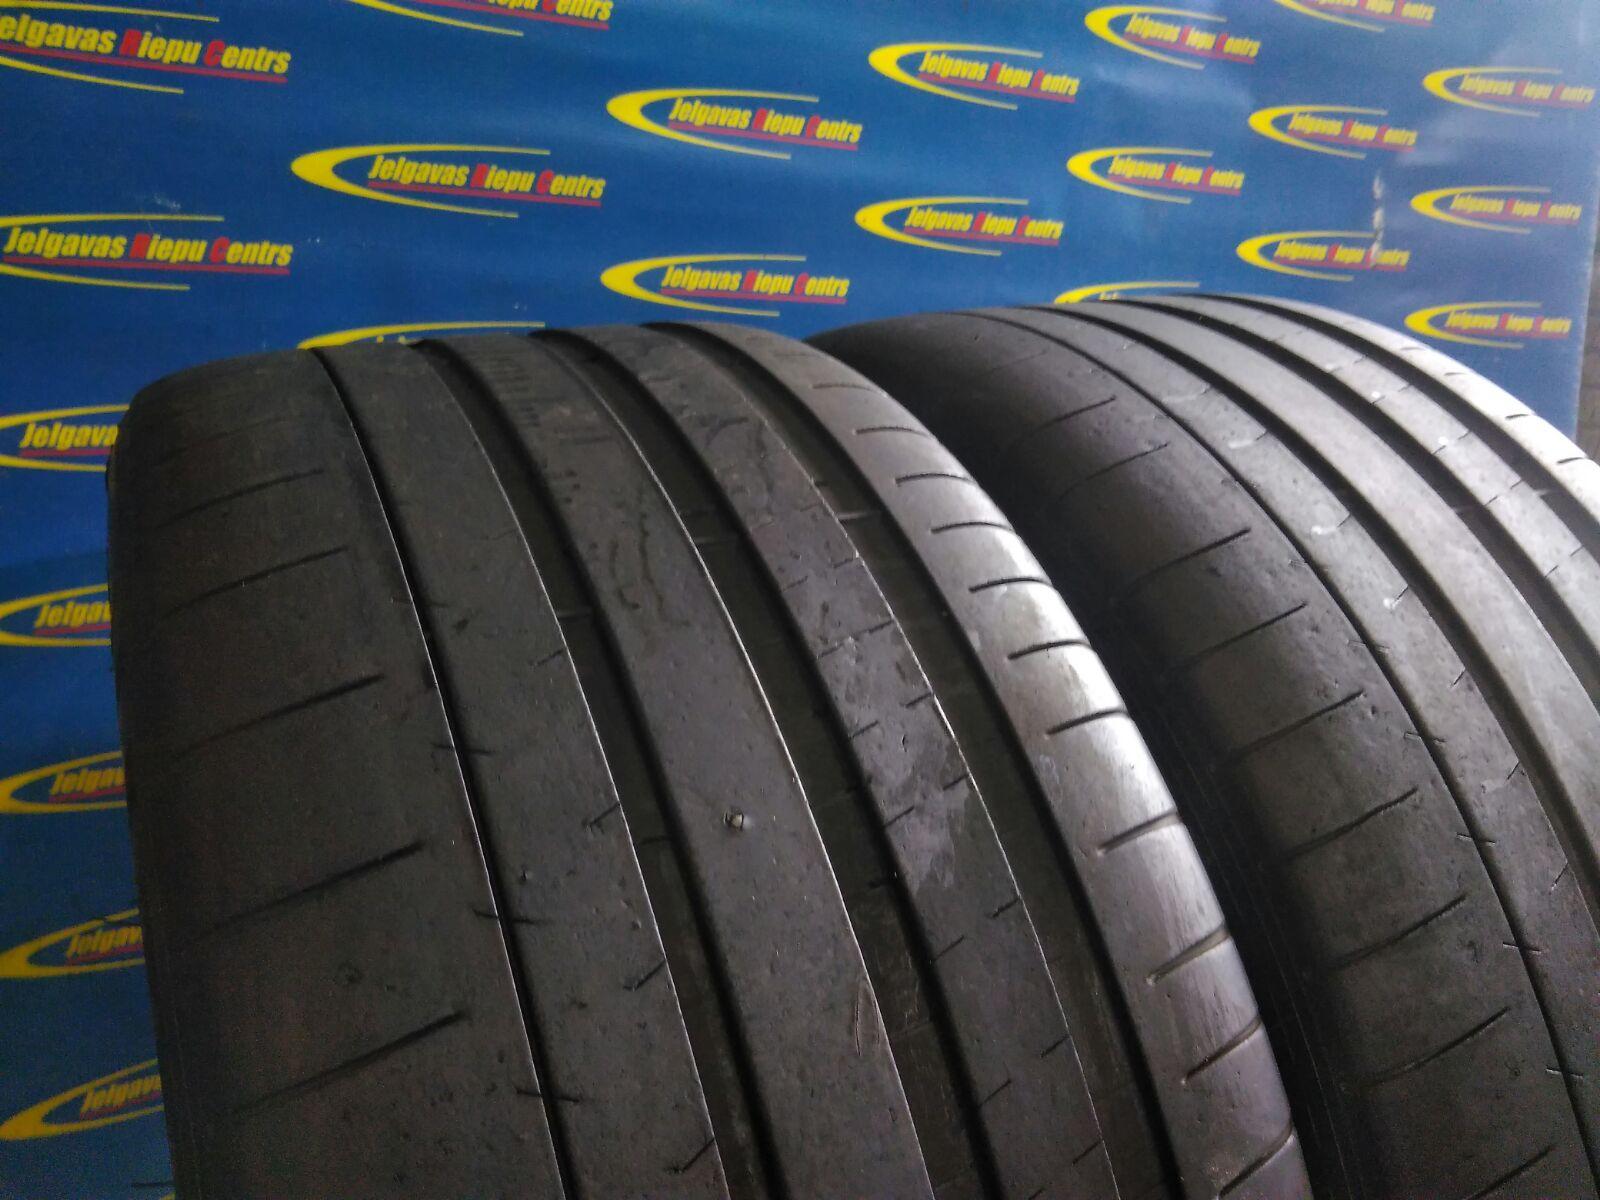 Lietota 255/40/R20 101Y Michelin PilotSuperSport (protektora dziļums 4.5...4mm)